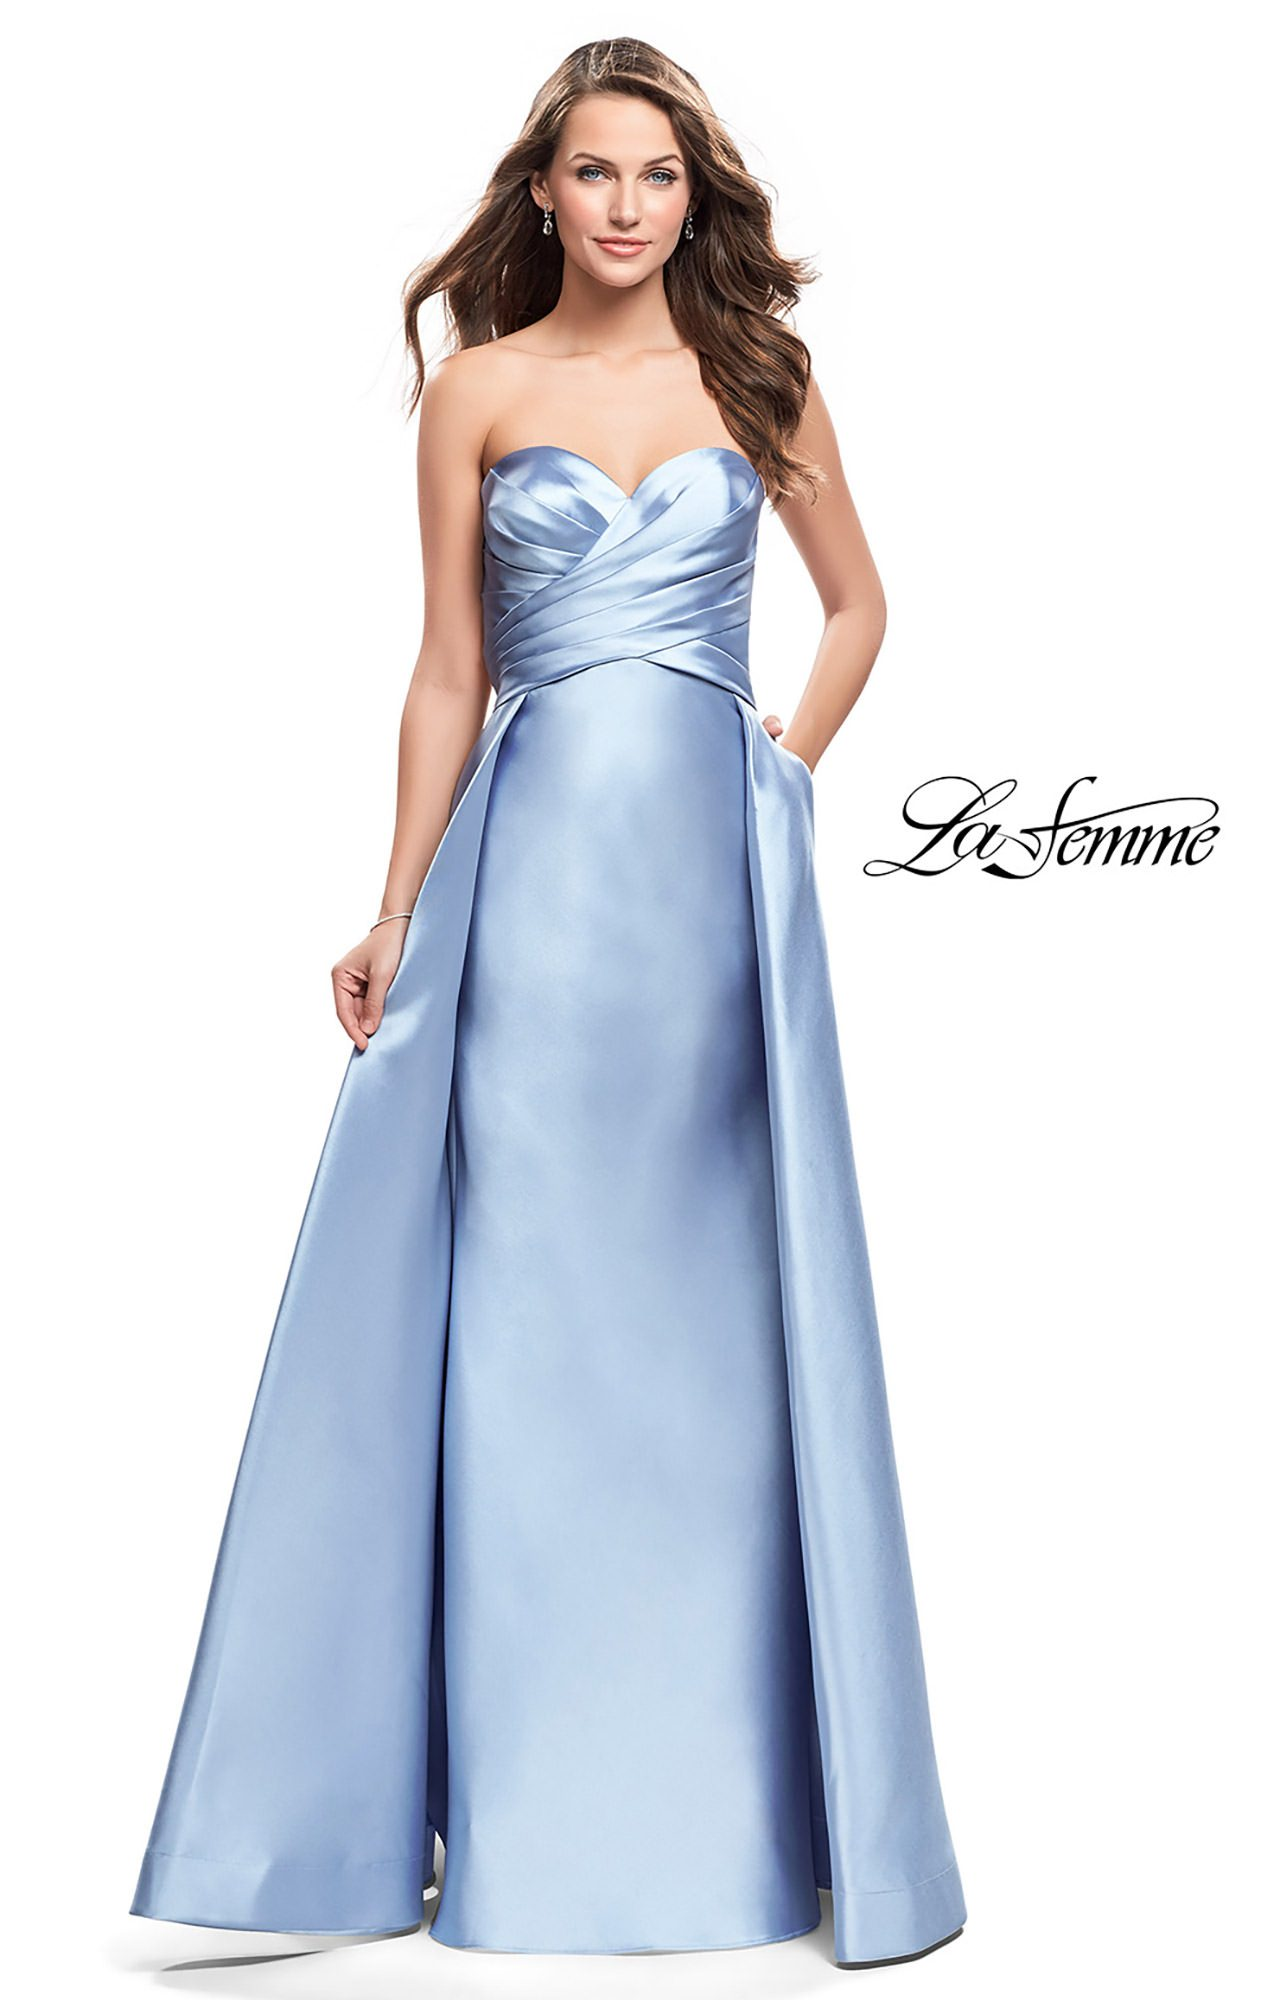 La Femme 25738 - Strapless A-Line Mikado Prom Dress